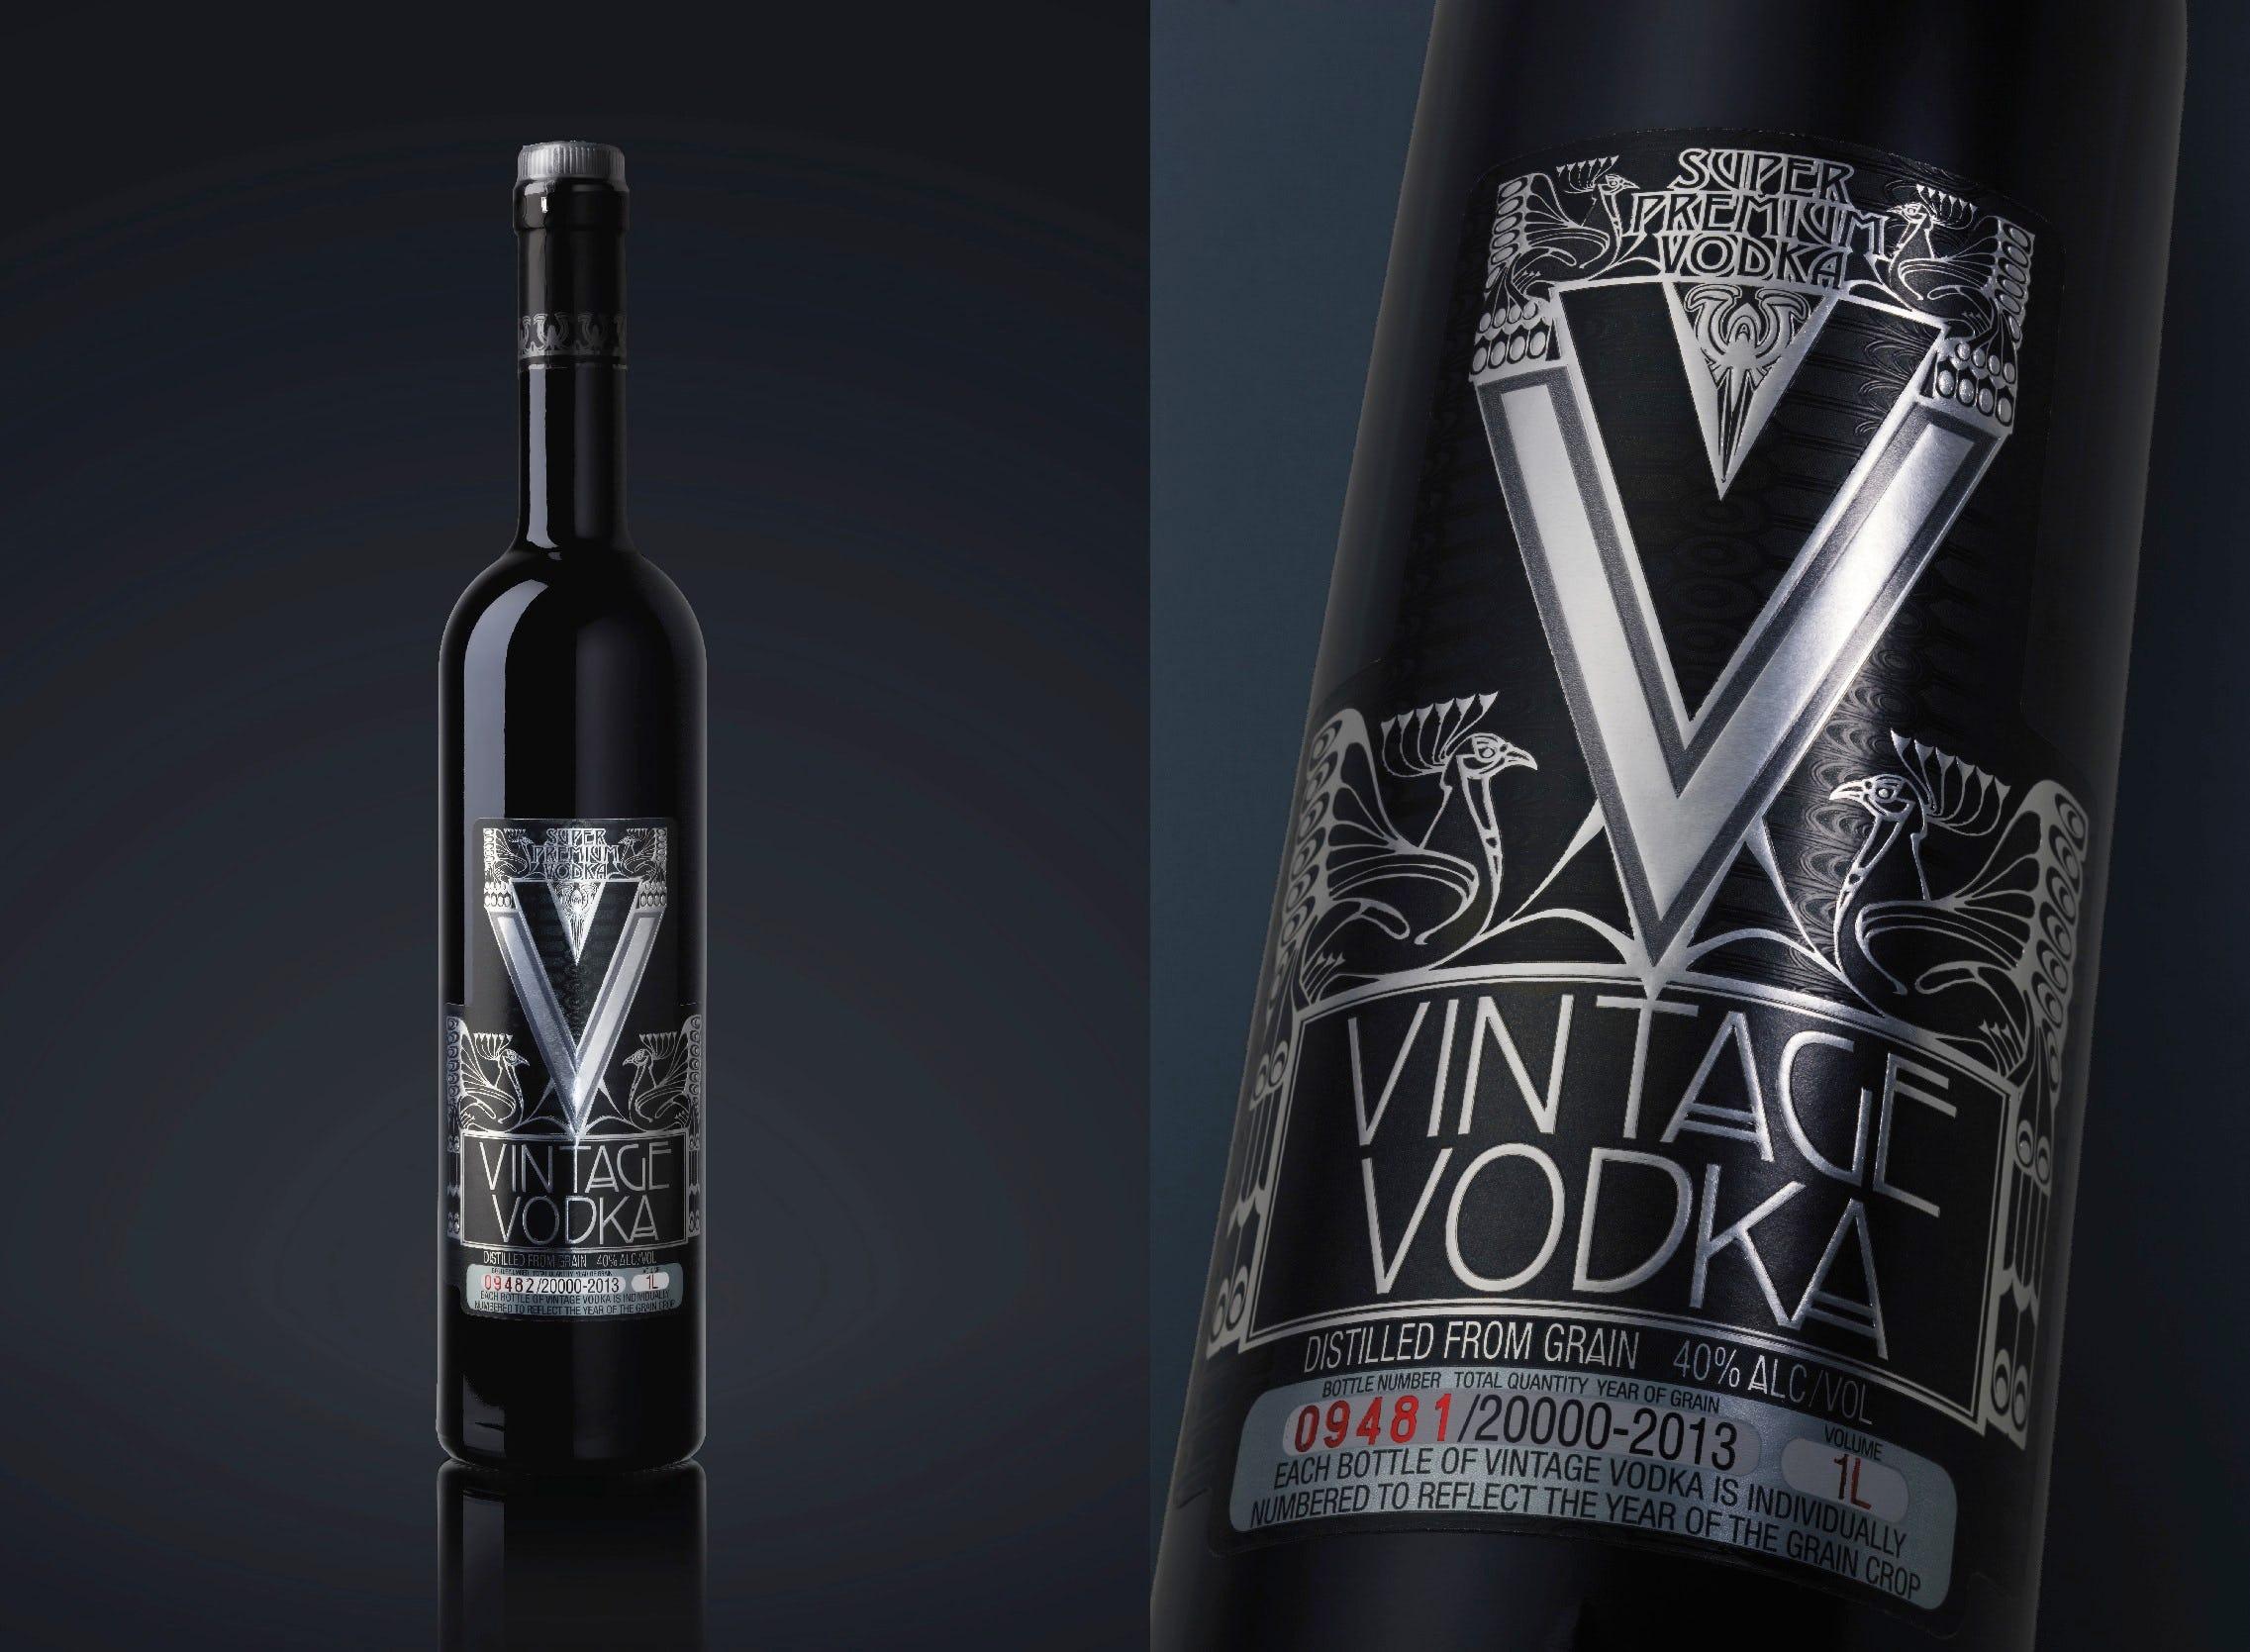 Vintage vodka 004